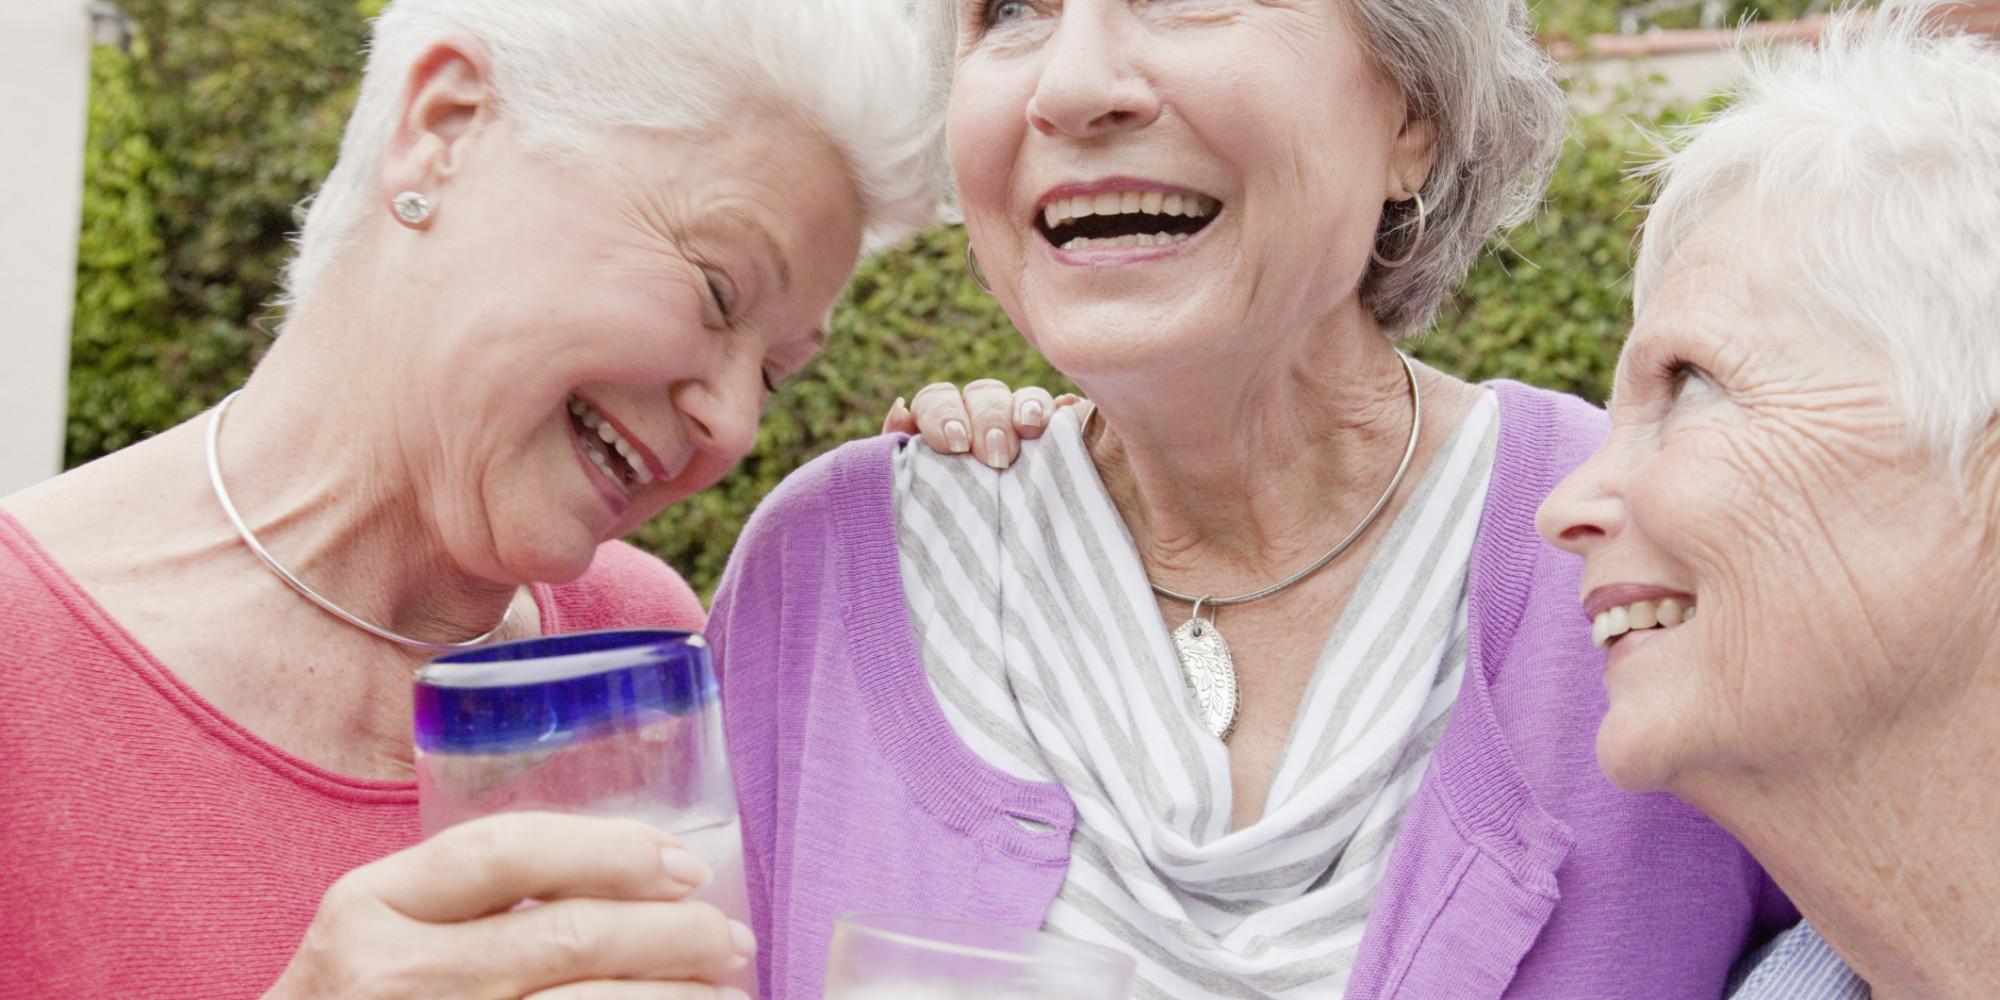 Older women seeking young men facebook groups